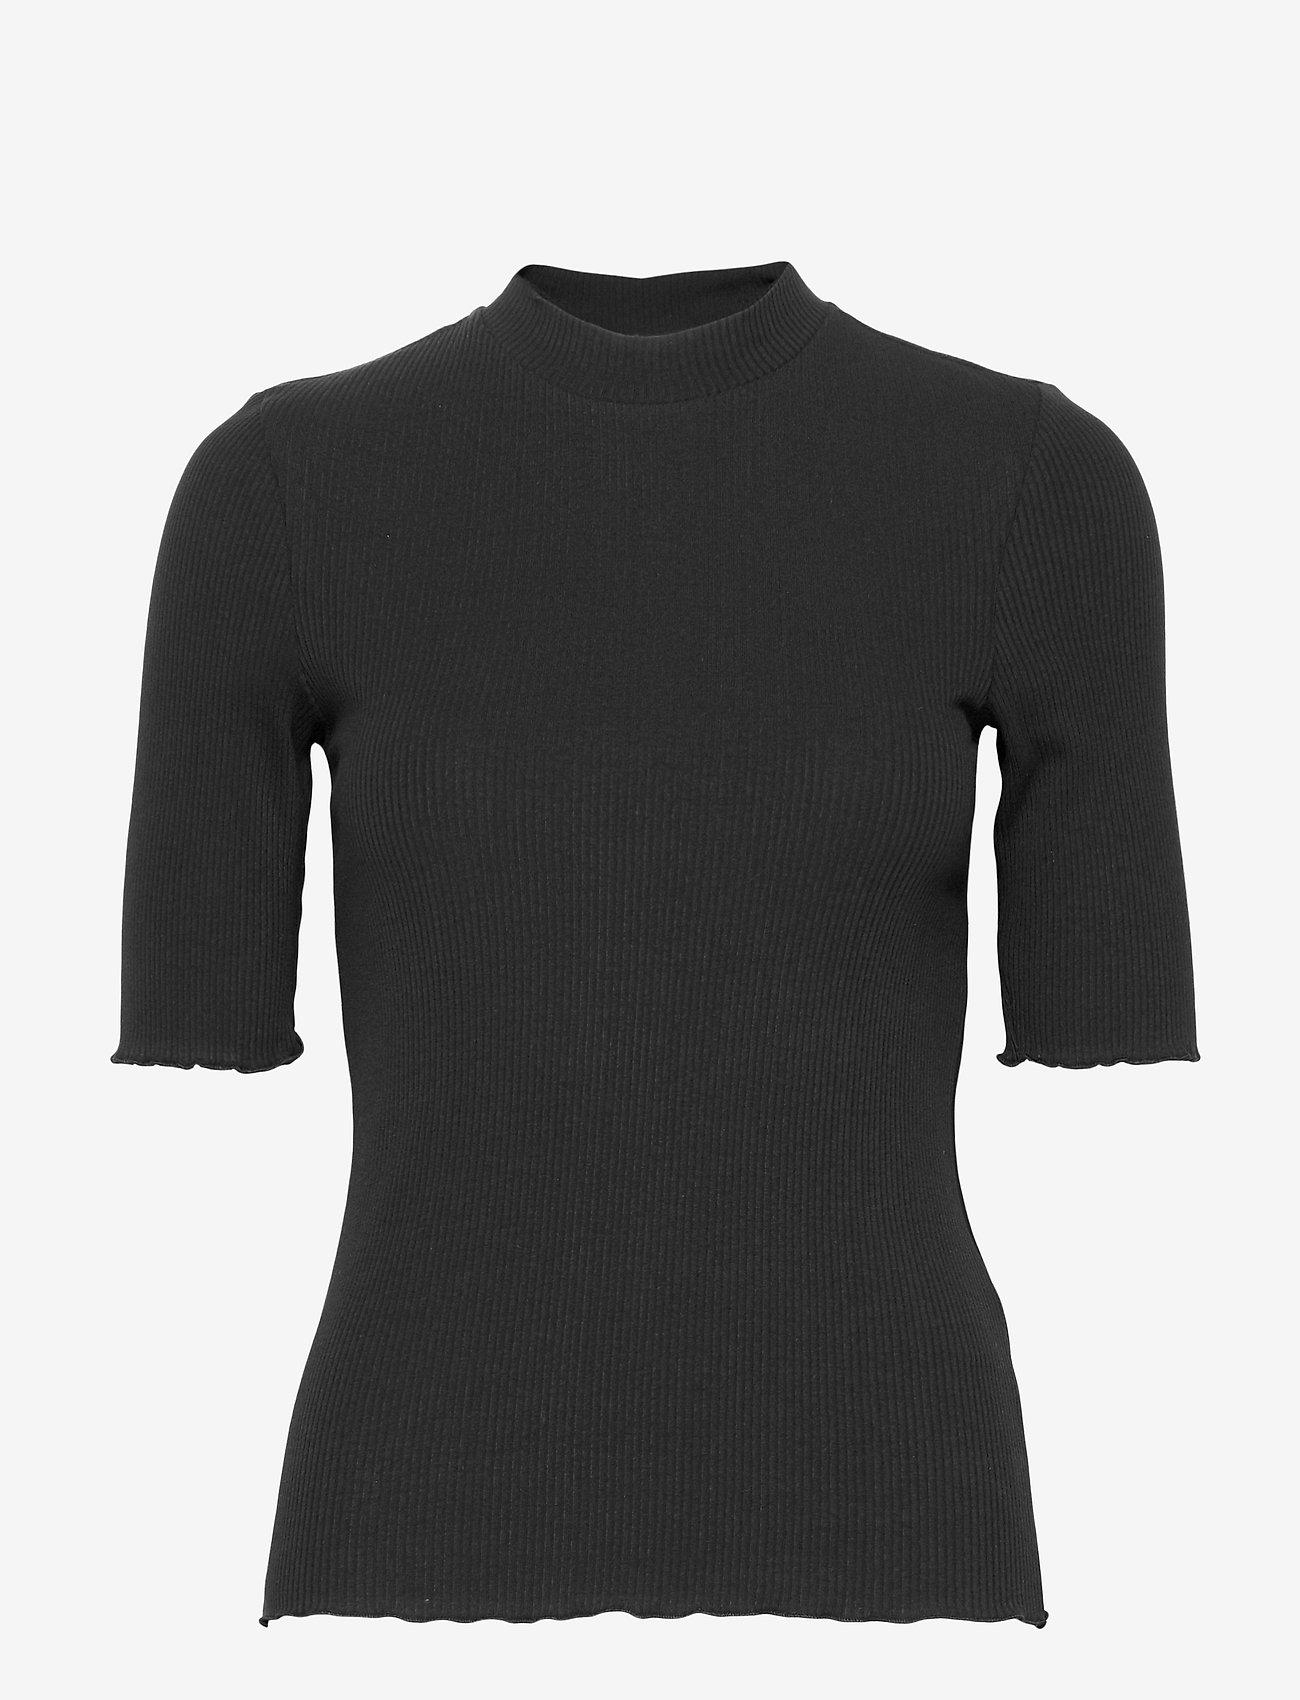 Selected Femme - SLFANNA 2/4 CREW NECK TEE S NOOS - t-shirts - black - 0